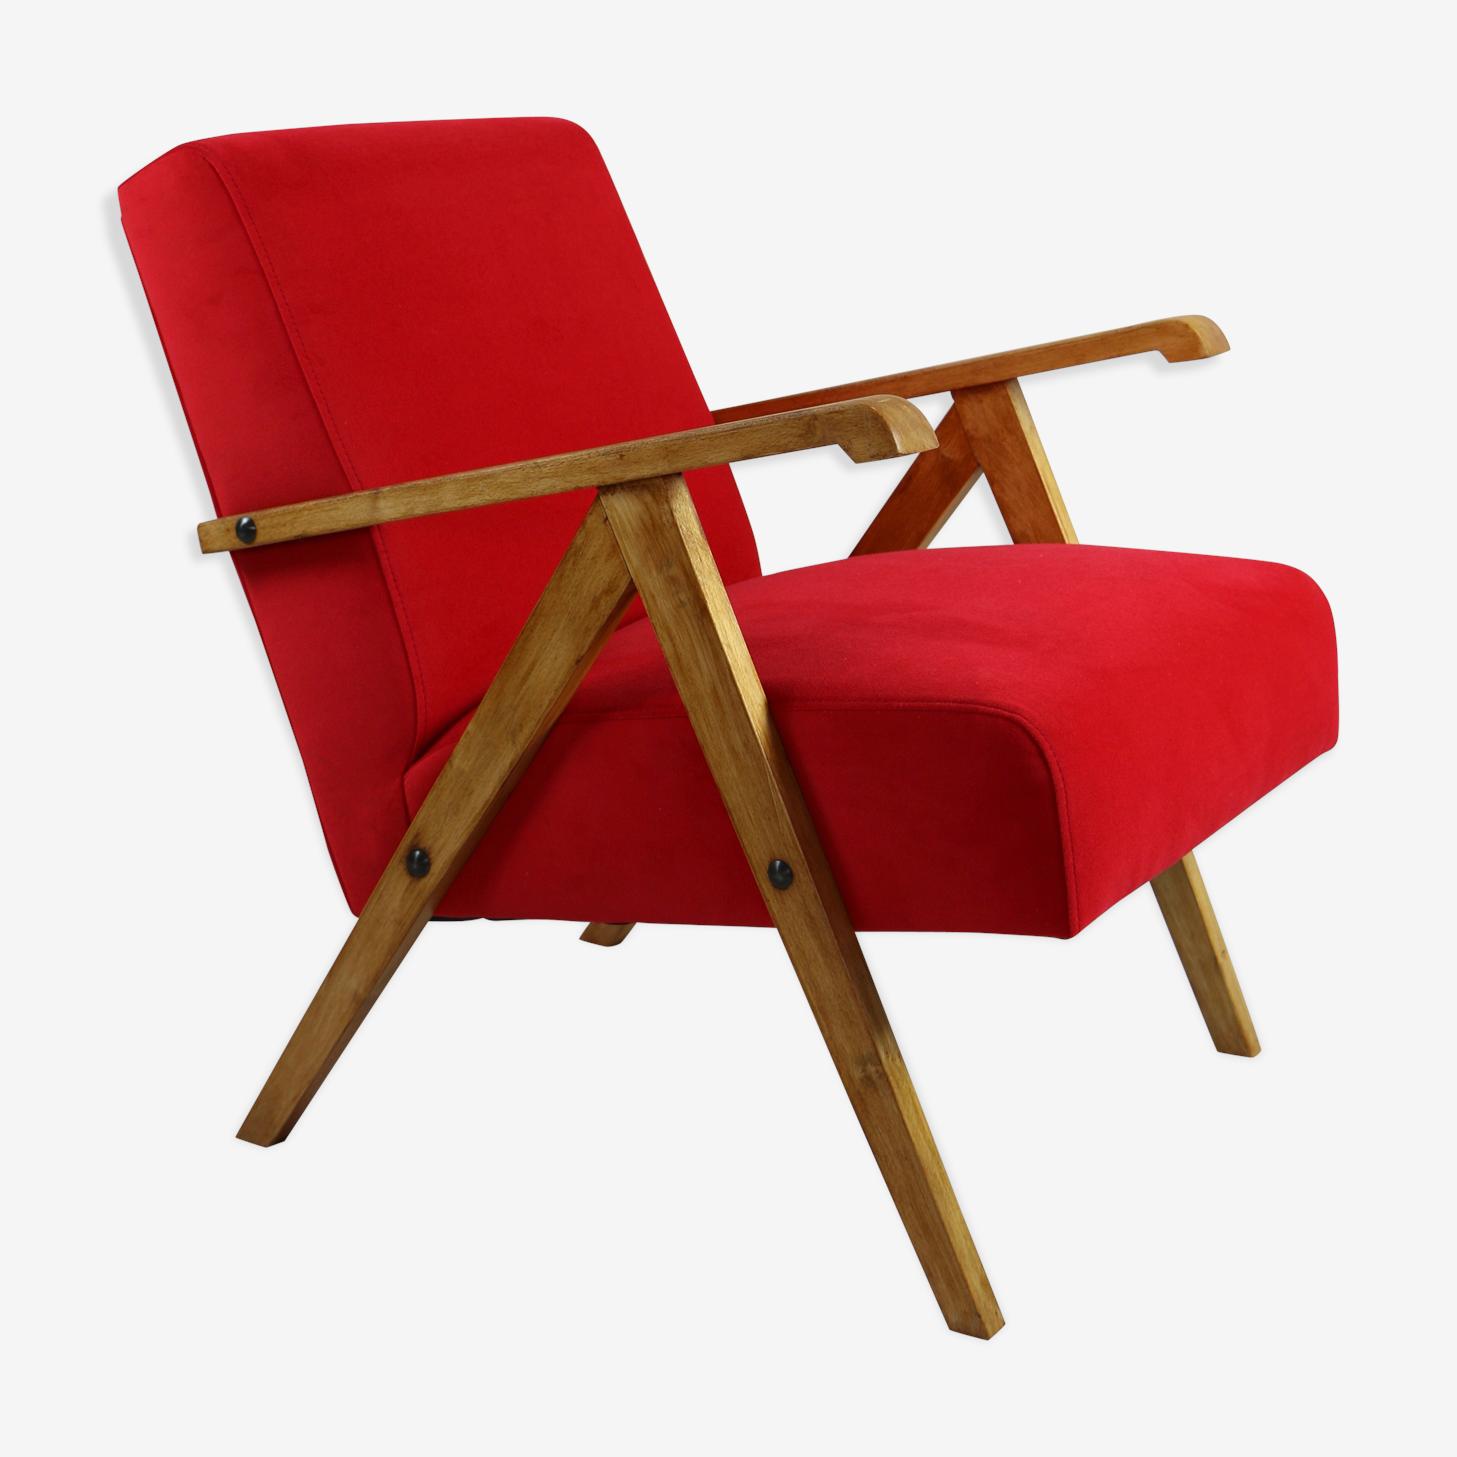 Vintage red velvet armchair, 1970